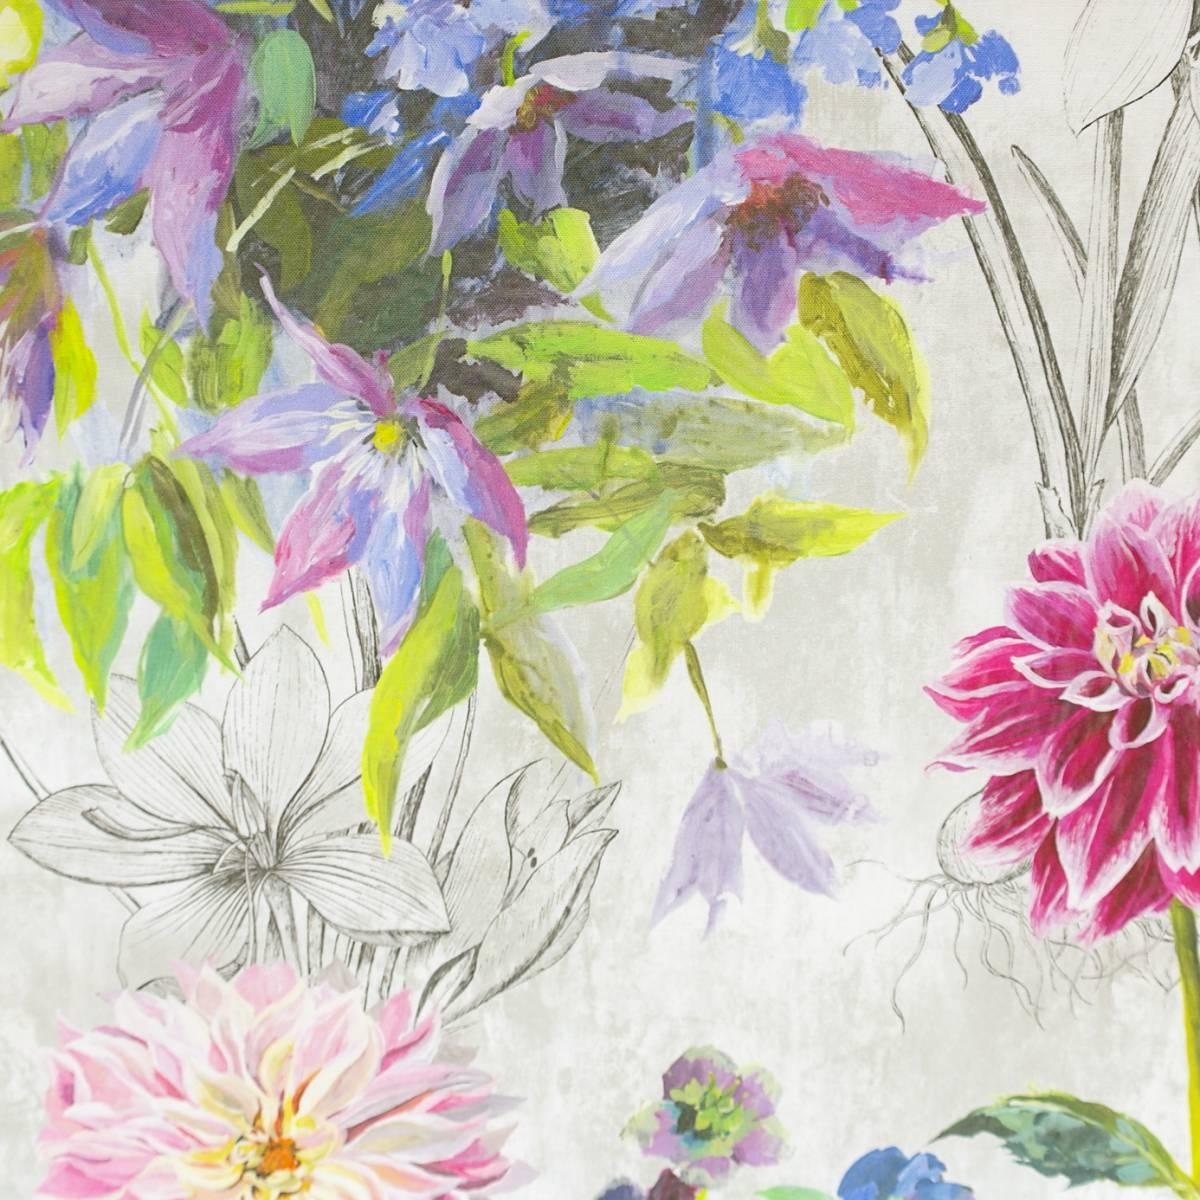 Saunier fabric peony fdg2558 01 designers guild jardin des plantes fabrics collection - Designers guild telas ...